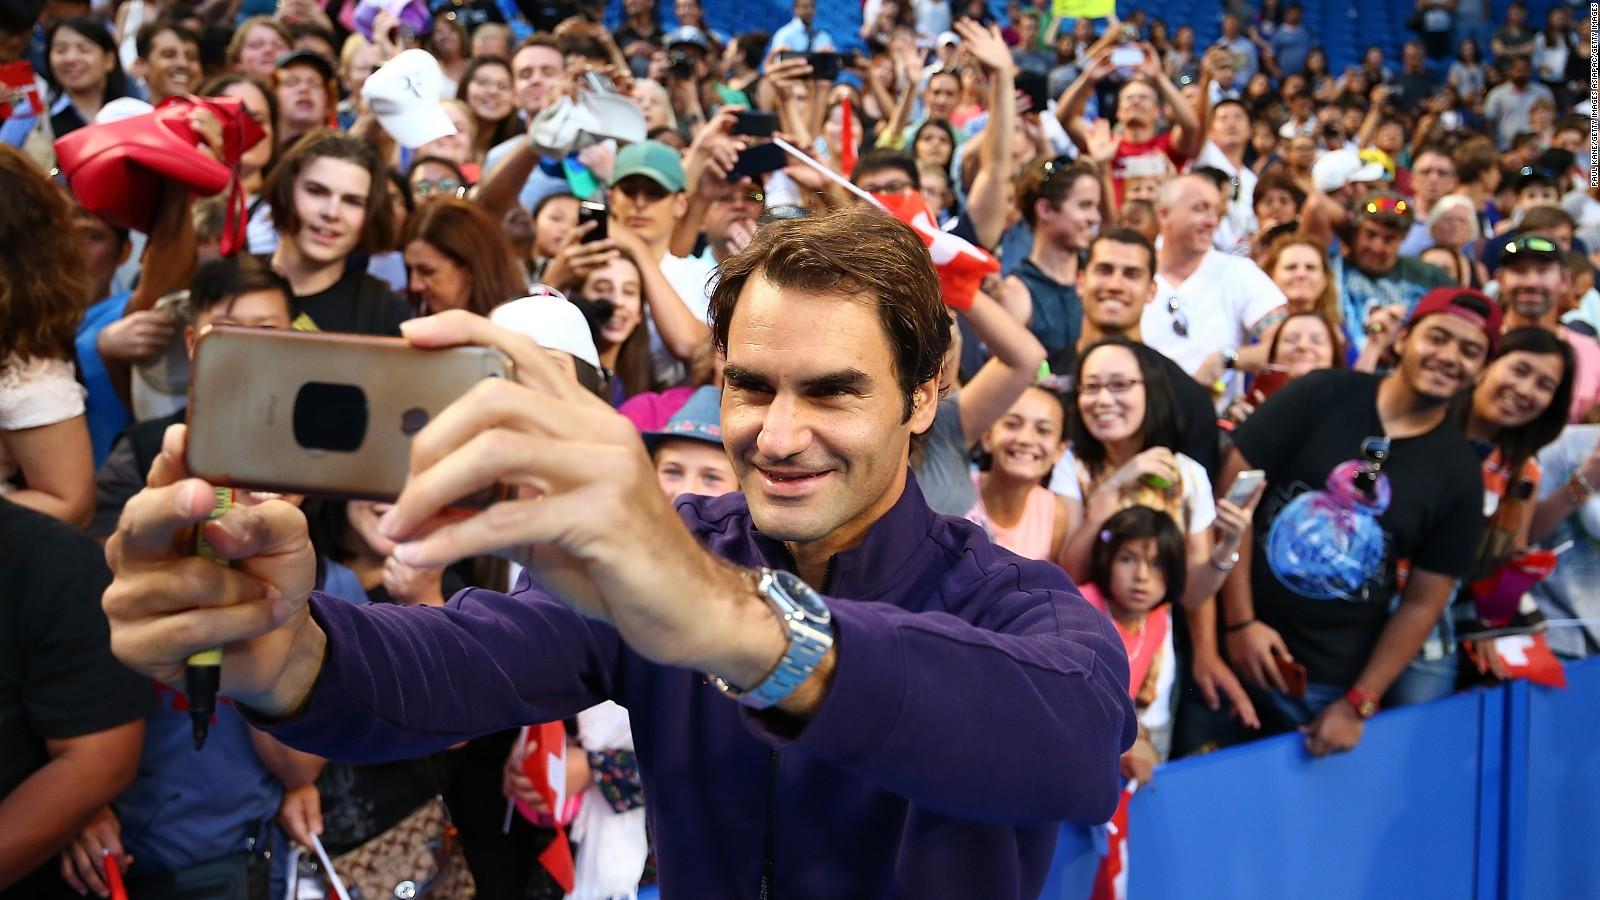 Roger Federer inspires global devotion like no other at Wimbledon - CNN c19a3aba00b1